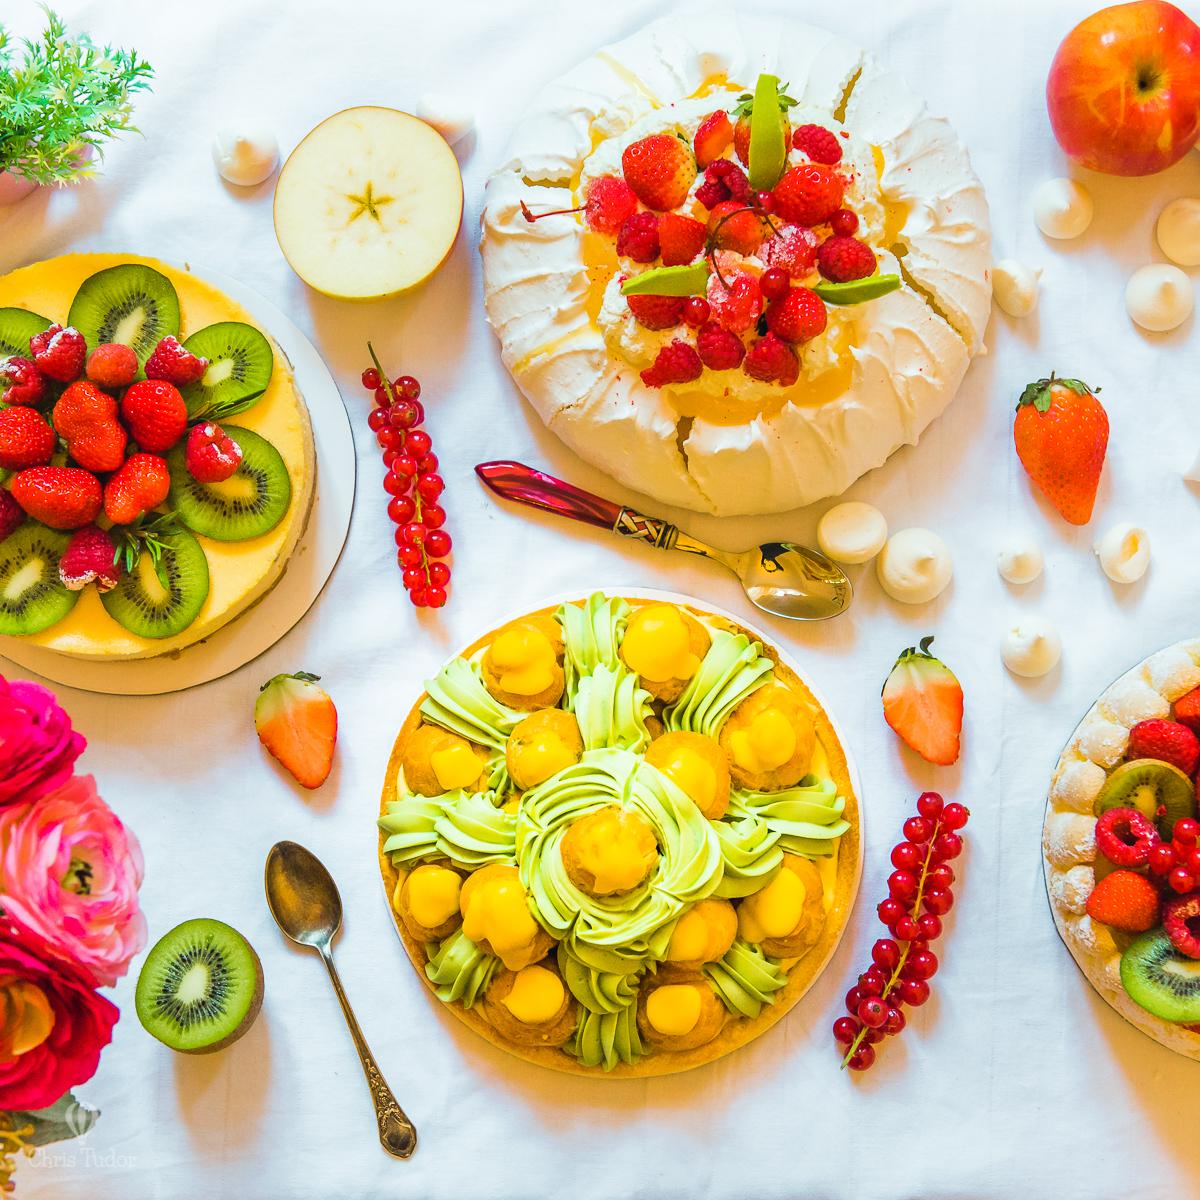 cristina-tudor-food-photography (28).jpg